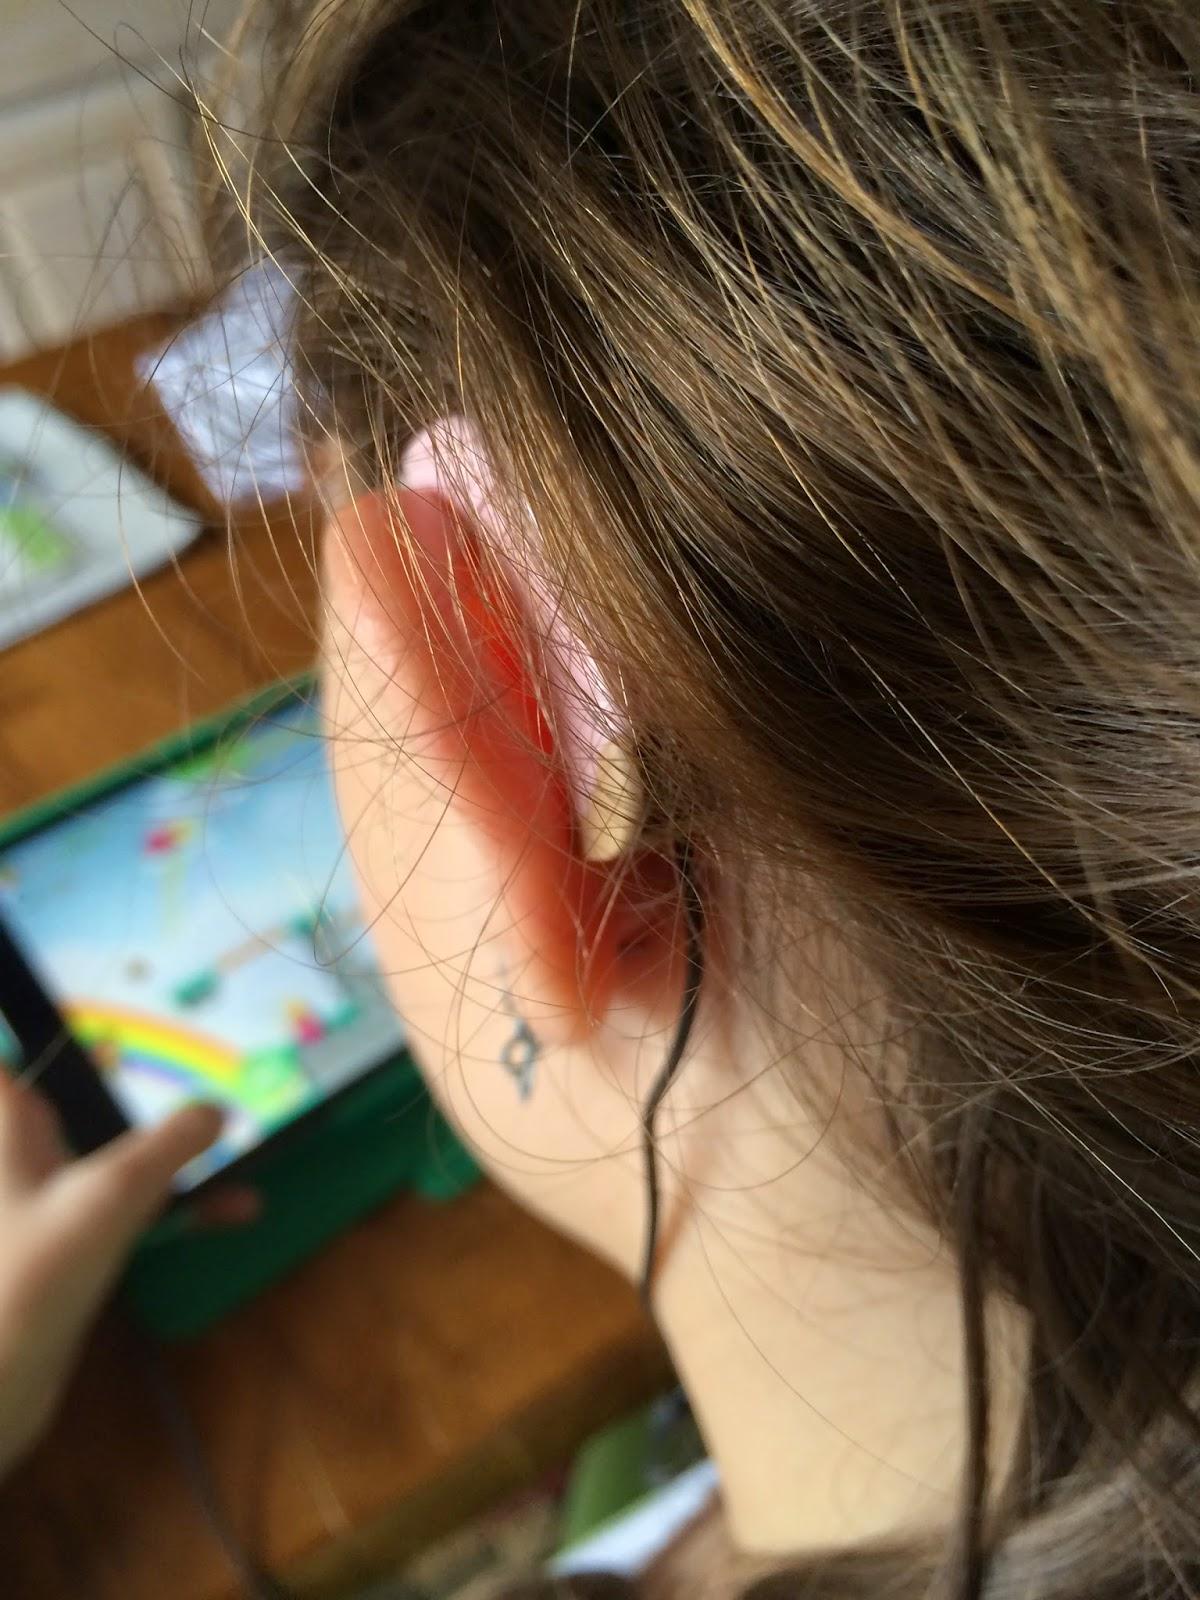 Magic Ear Kids Ear Hook Headphones For Hearing Aid Users